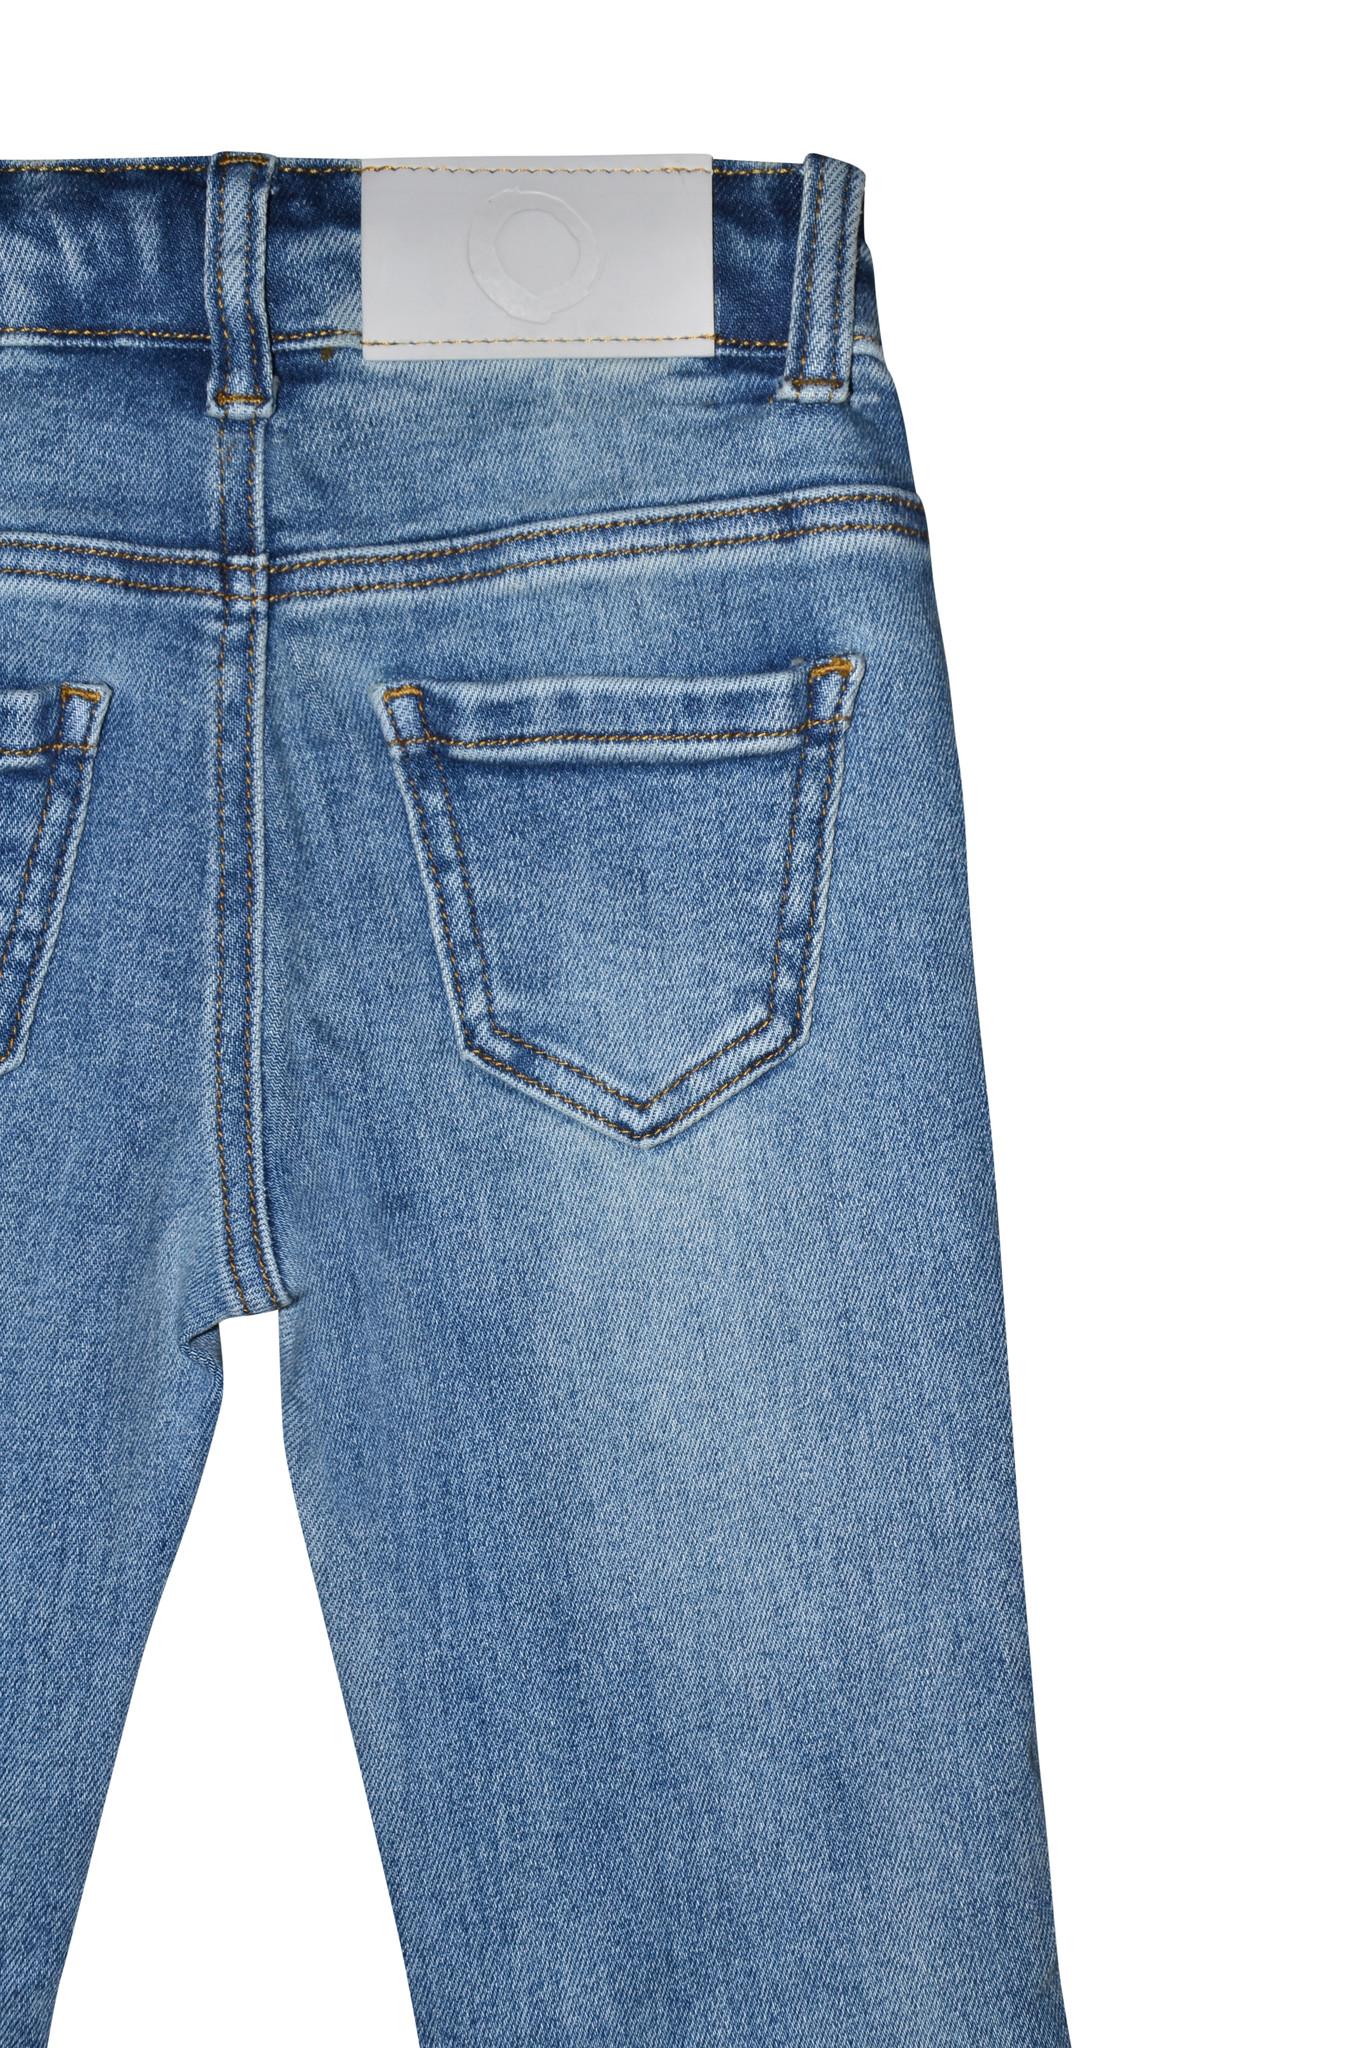 Madison jeans-5